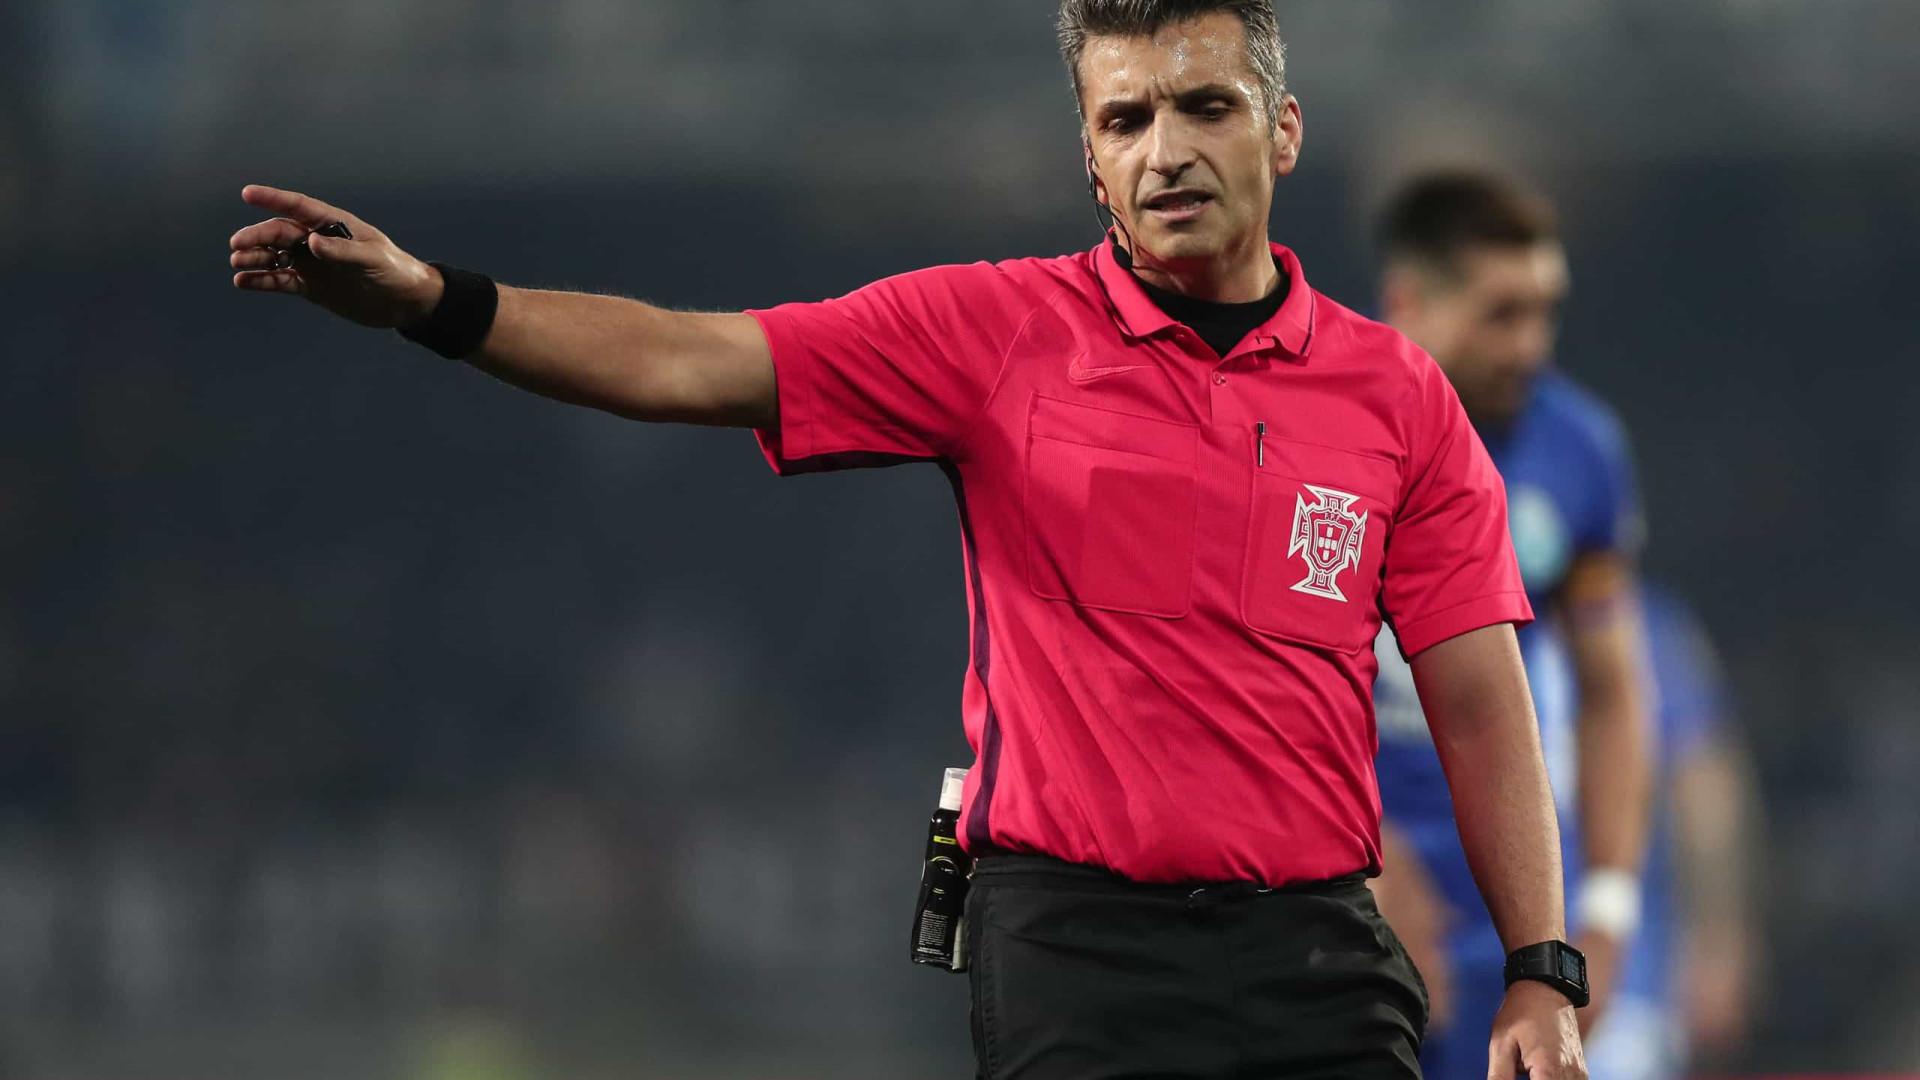 Rui Costa é o árbitro do encontro entre o Sporting e o Marítimo